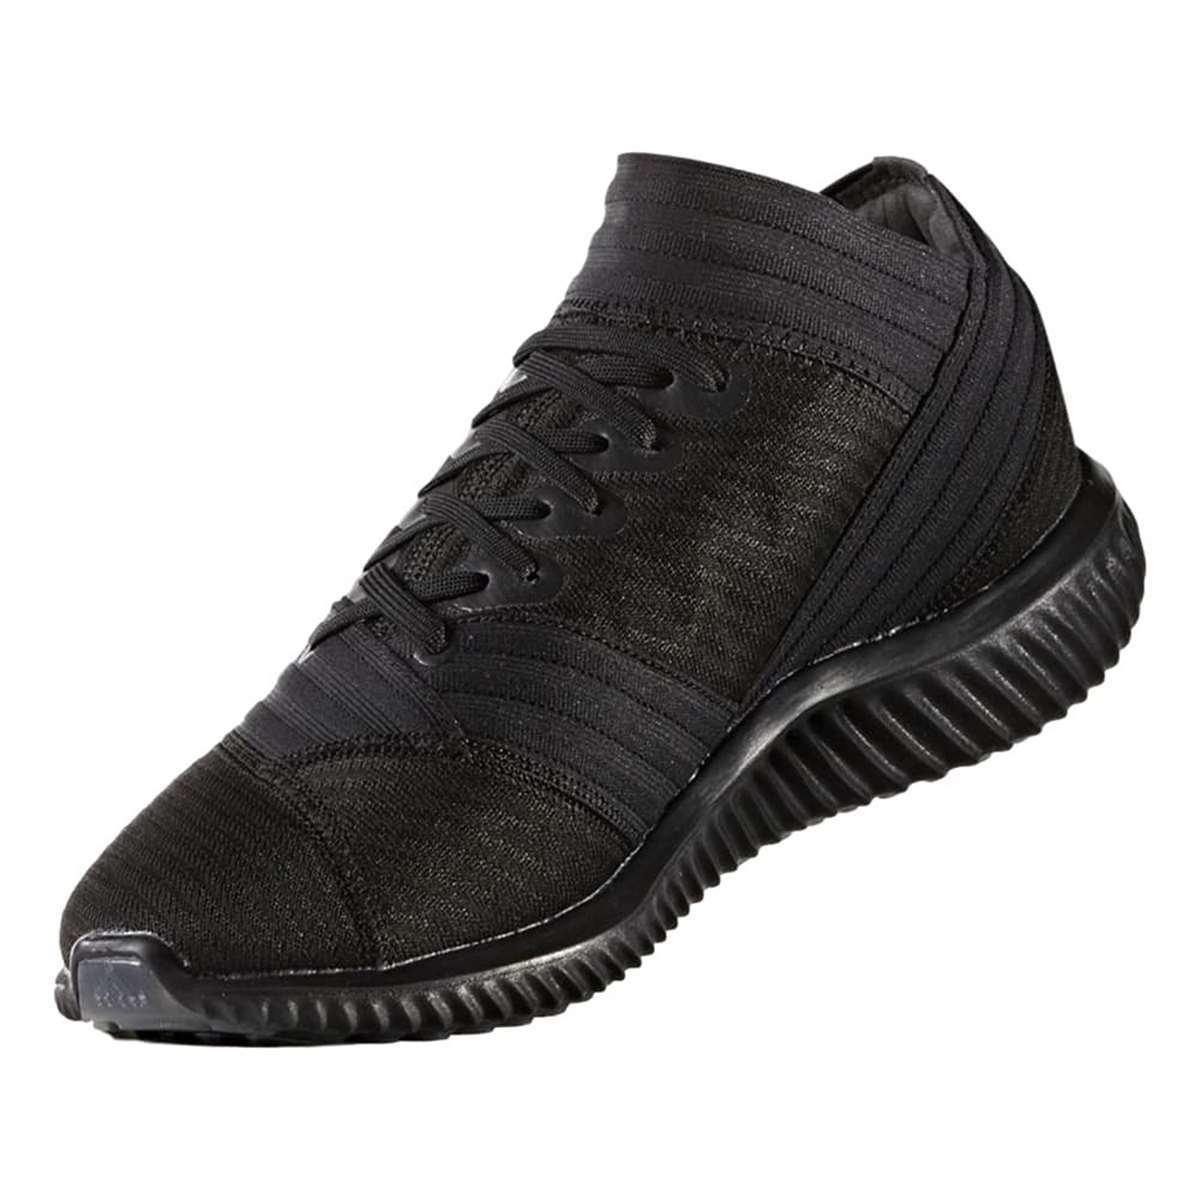 Adidas Black Tango Nemeziz Shoes 17.1 TR Sneakers NEW